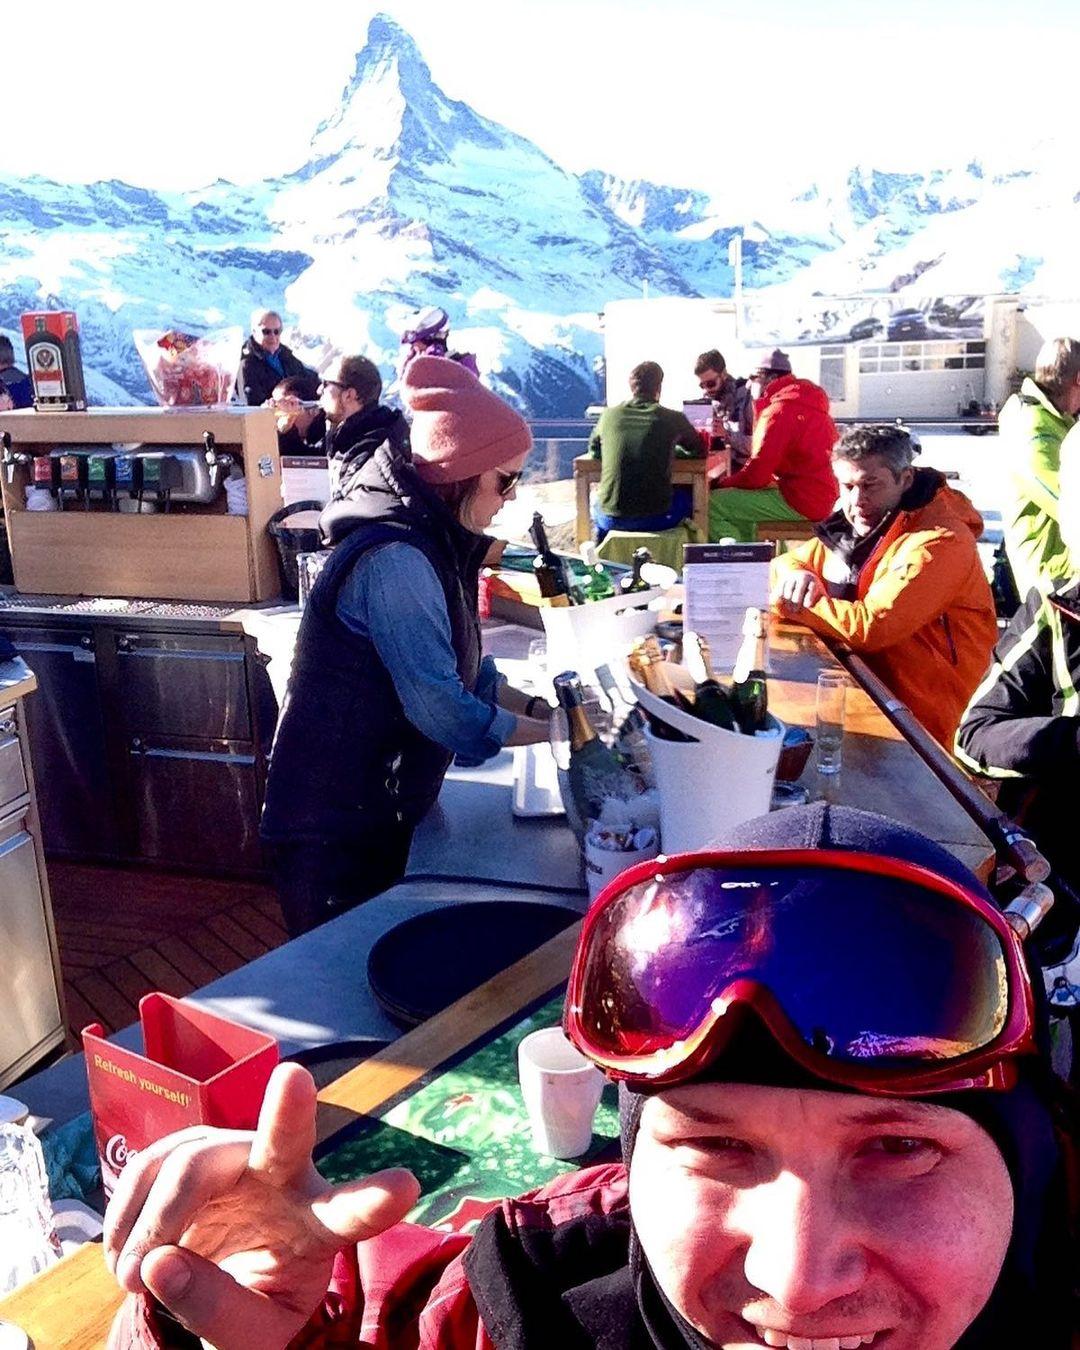 berlibur ke Zermatt swiss main ski